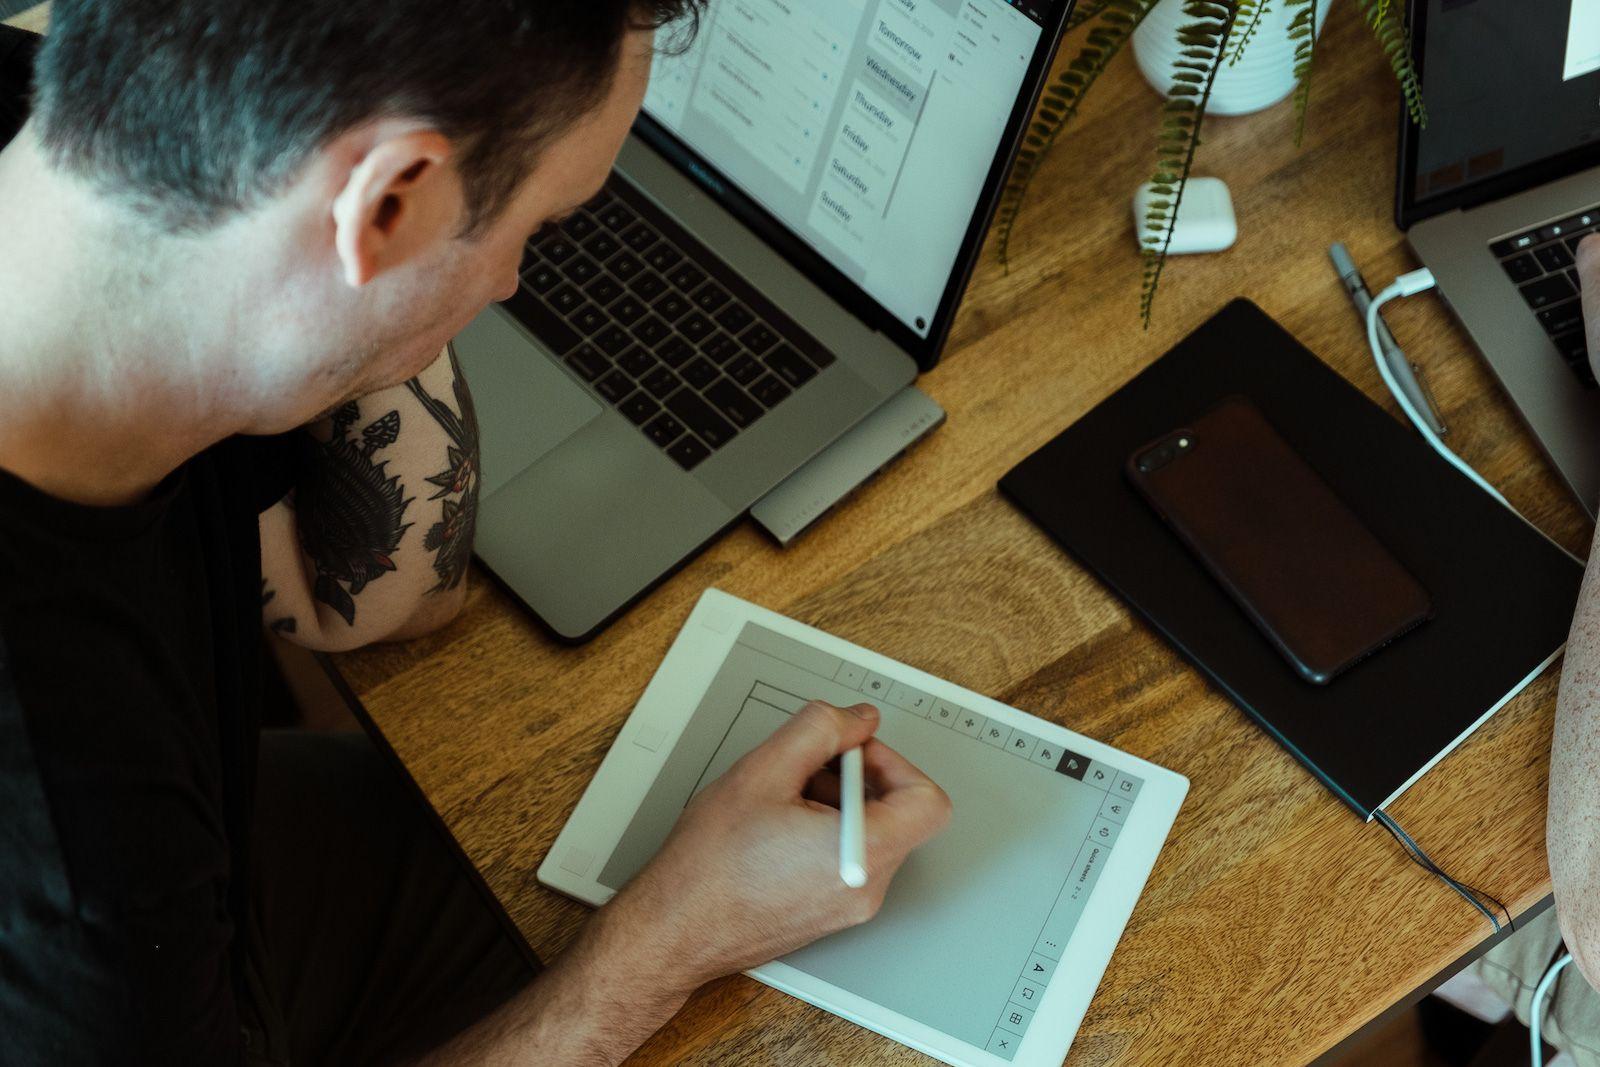 designer using tablet to sketch ideas